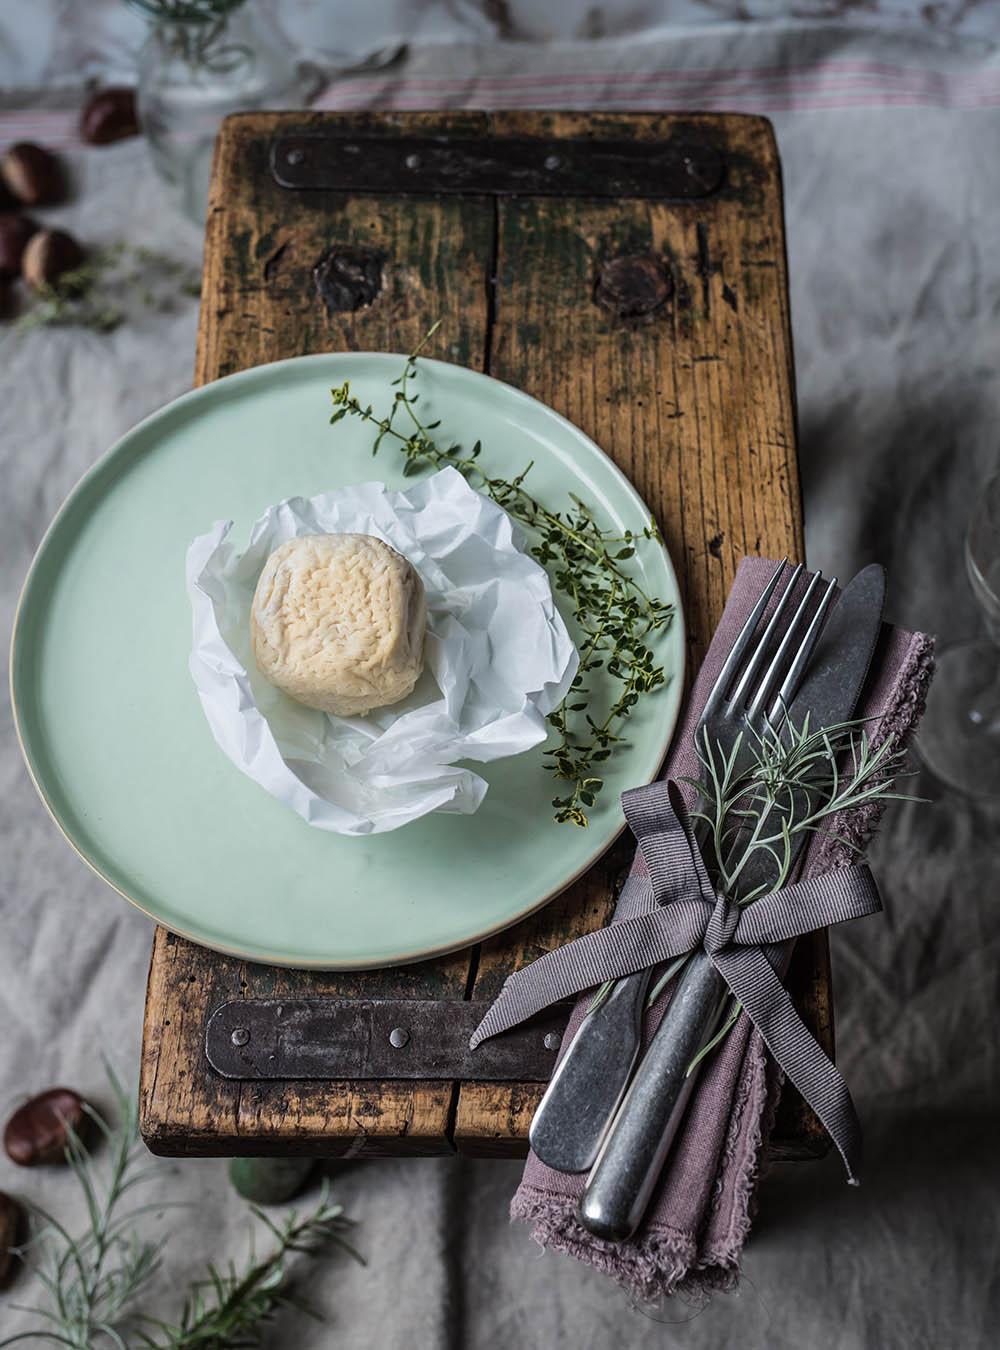 Perlhuhnbrust mit Marronen, Crottin de Chavignol A.O.P. gebackenem Ziegenkäsetaler und Rote Bete Sauce